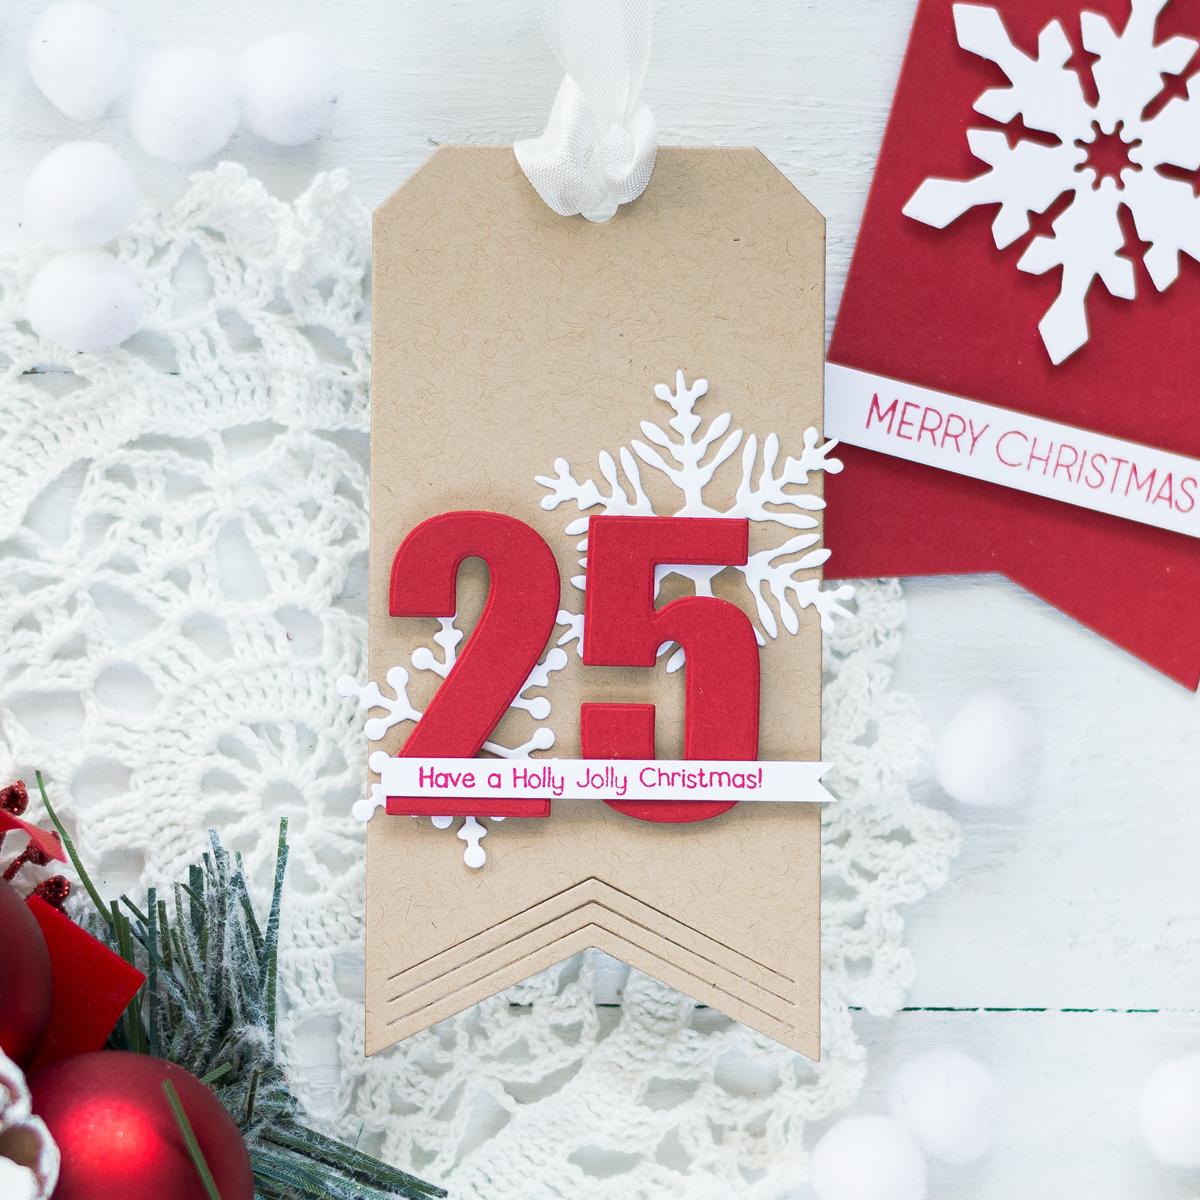 Christmas Tags. Card by Svitlana Shayevich